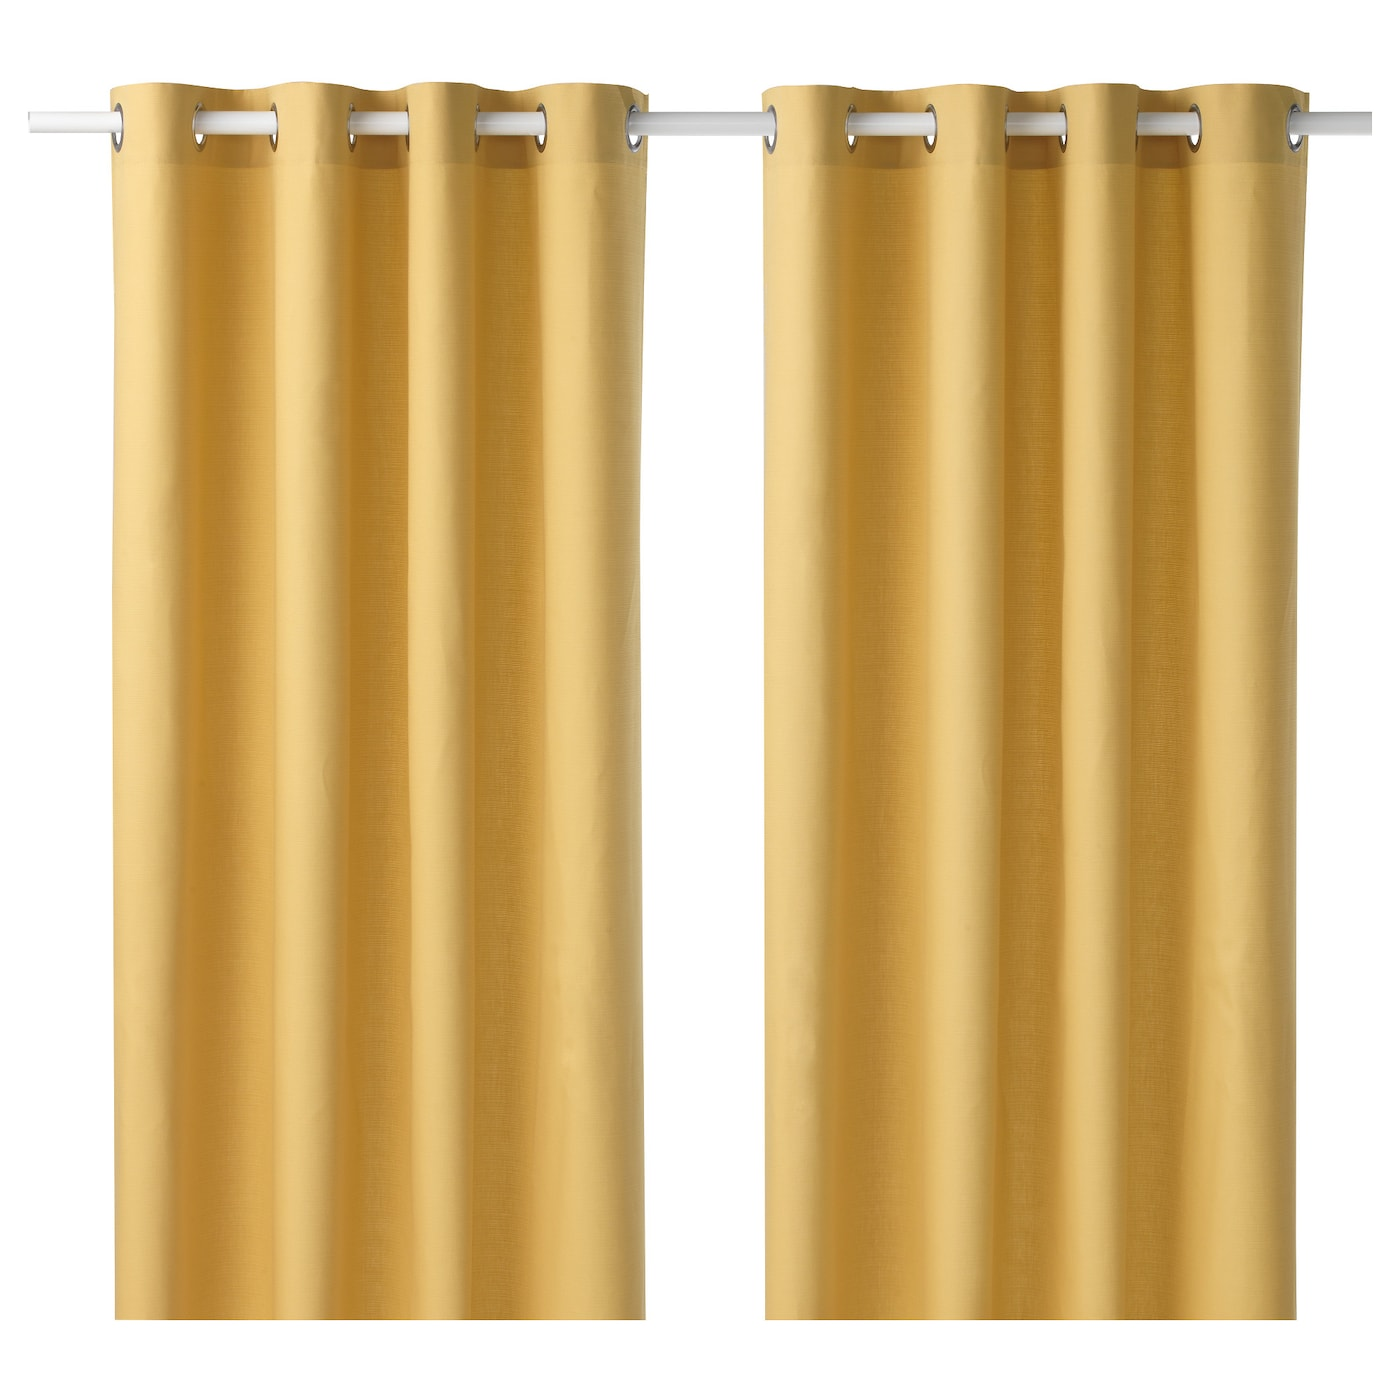 Gardinen klemmstange ikea gardinen 2018 for Ikea dekoration